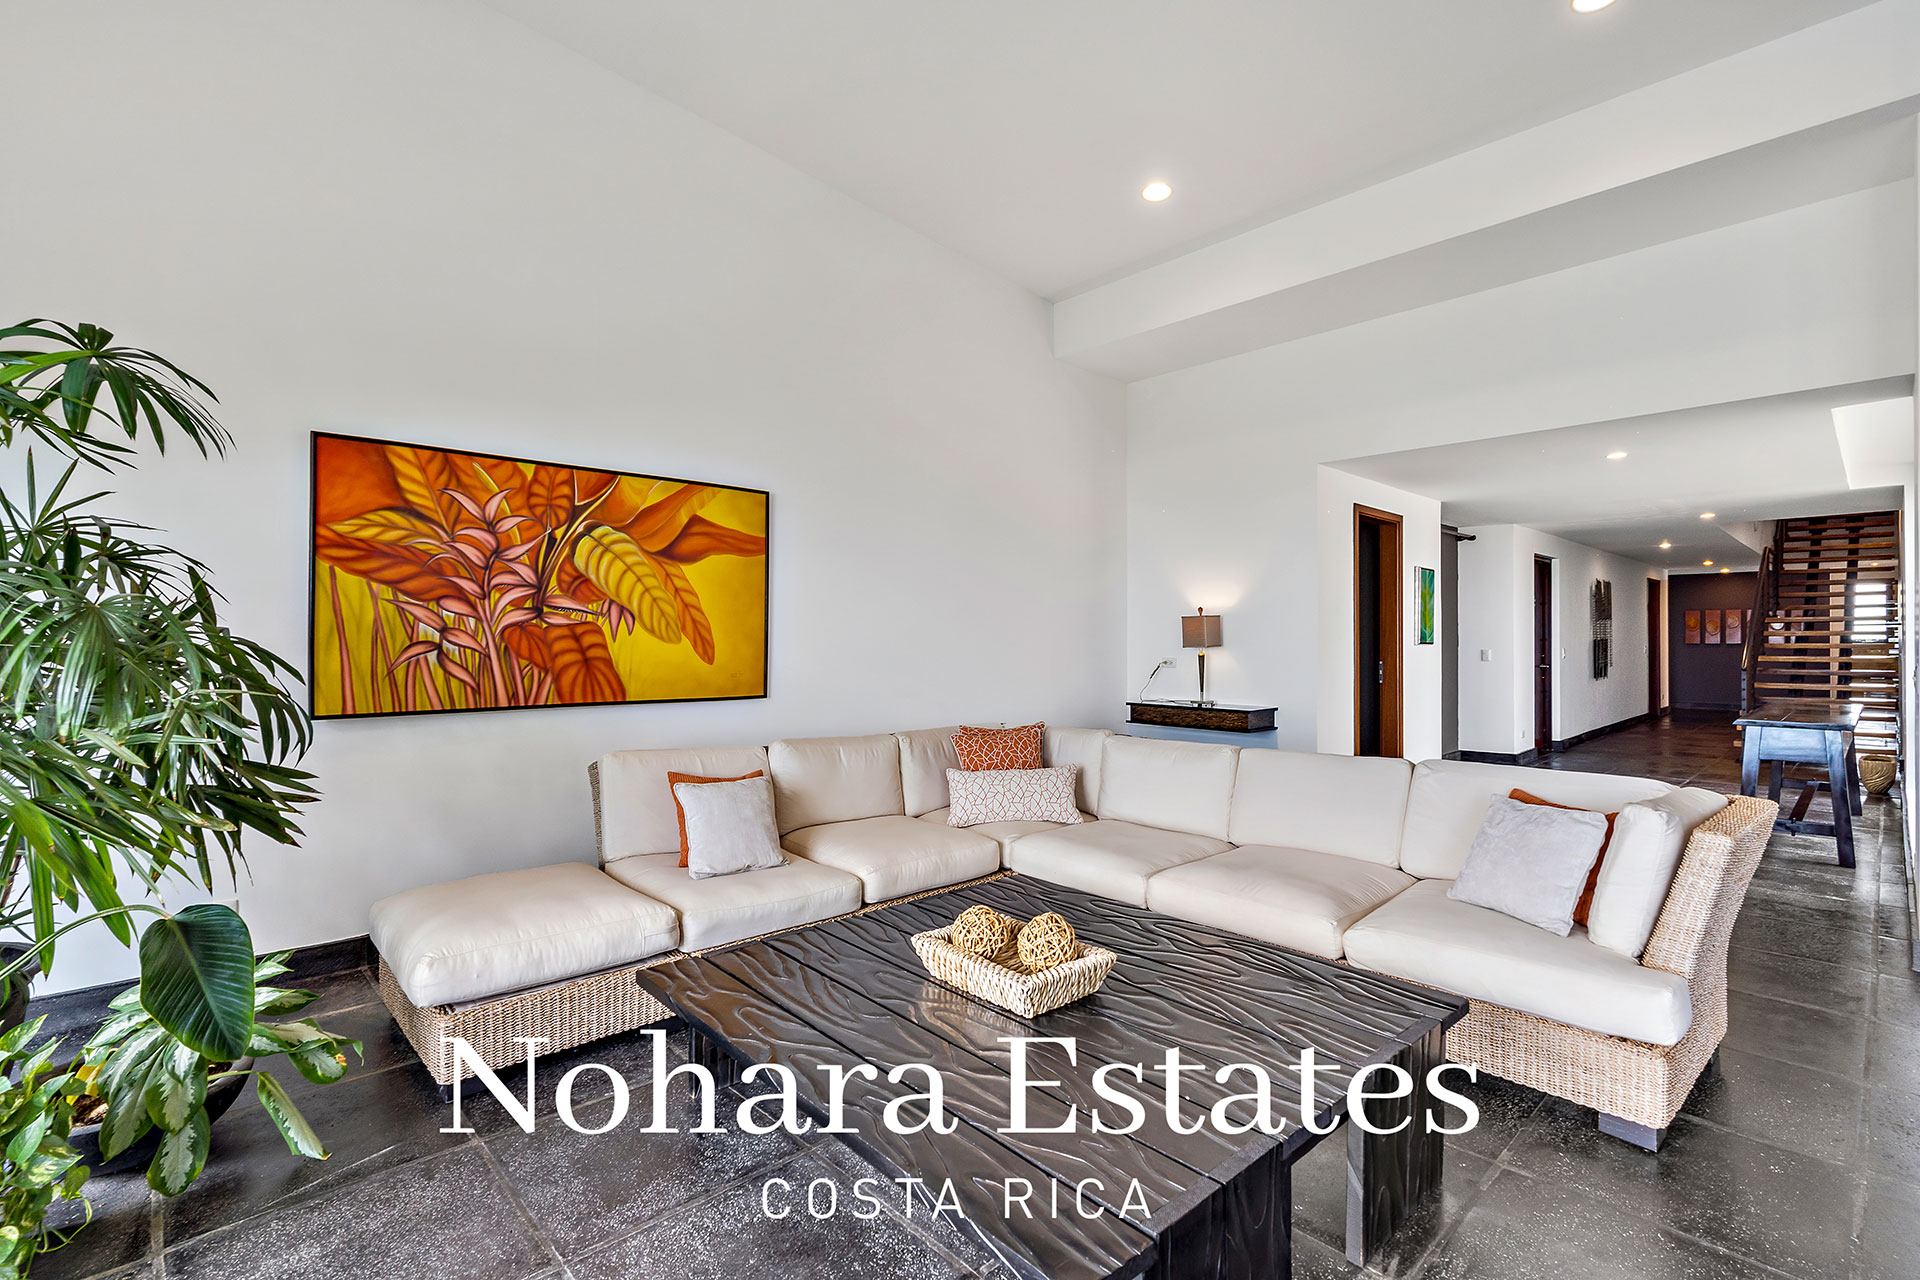 Nohara Estates Costa Rica 122 Apartment Quepos Los Altos 4